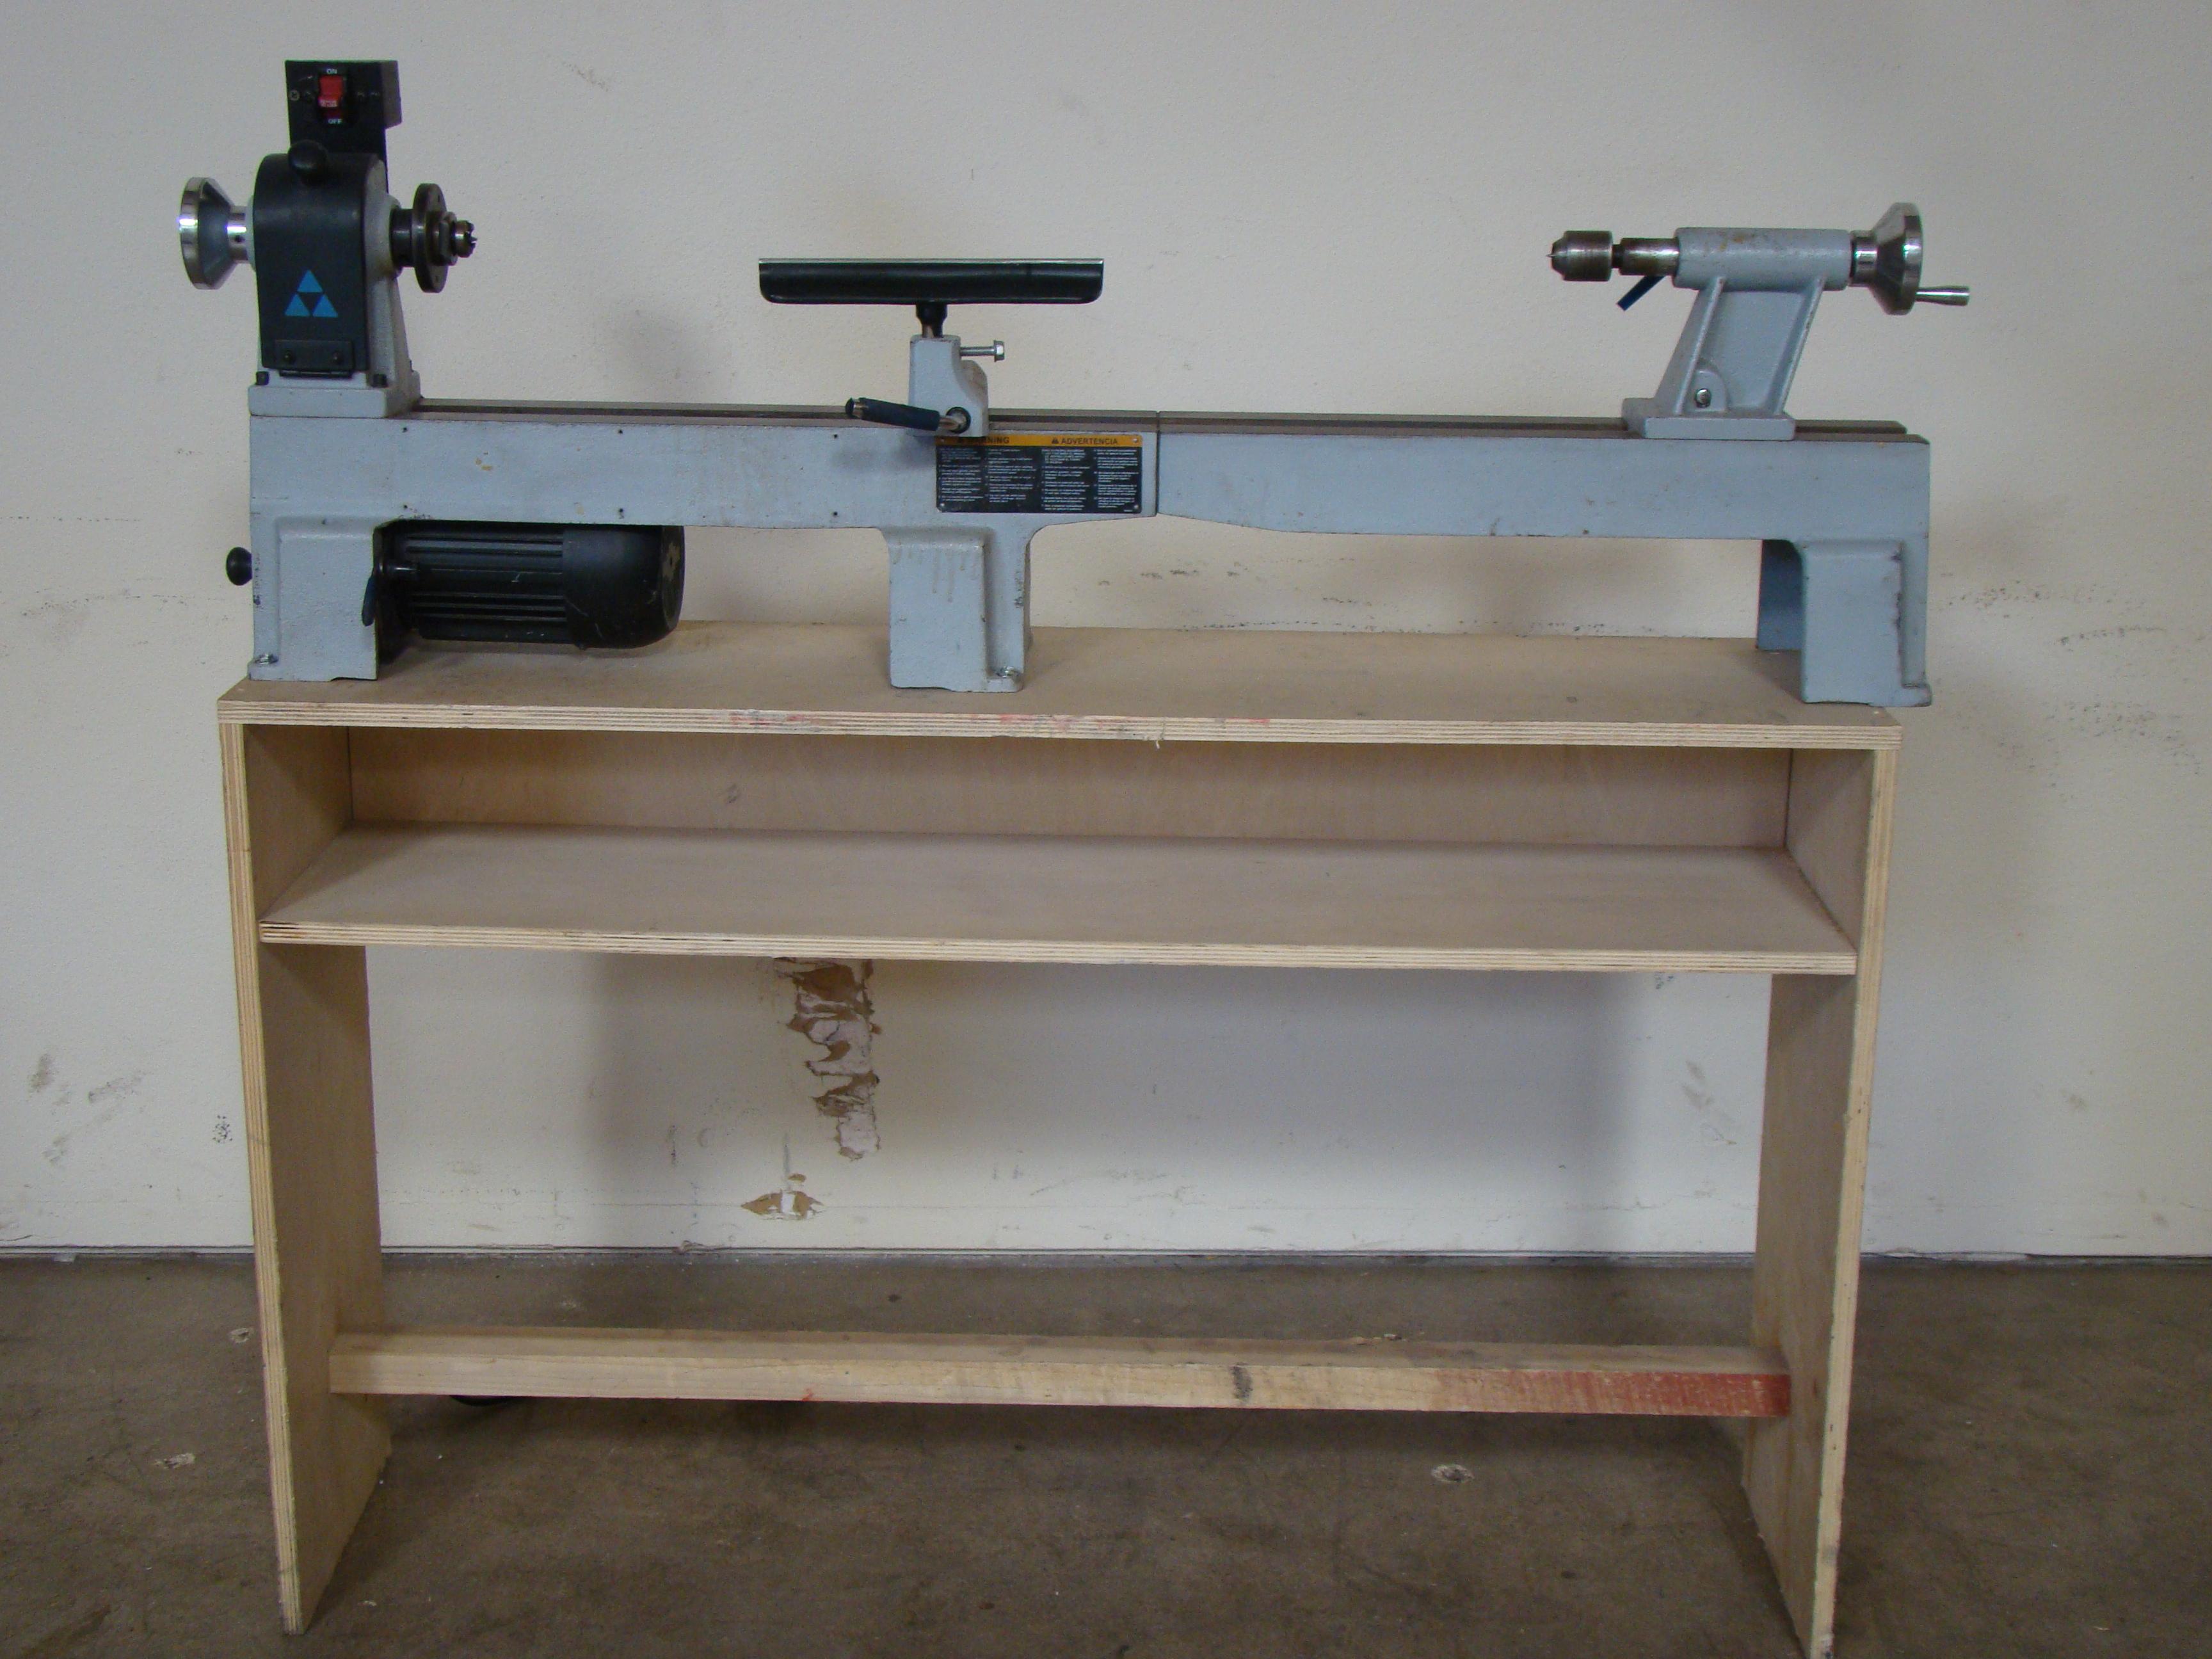 Delta Wood Lathe Model LA200 1/2 HP 120V 1PH - Image 9 of 9